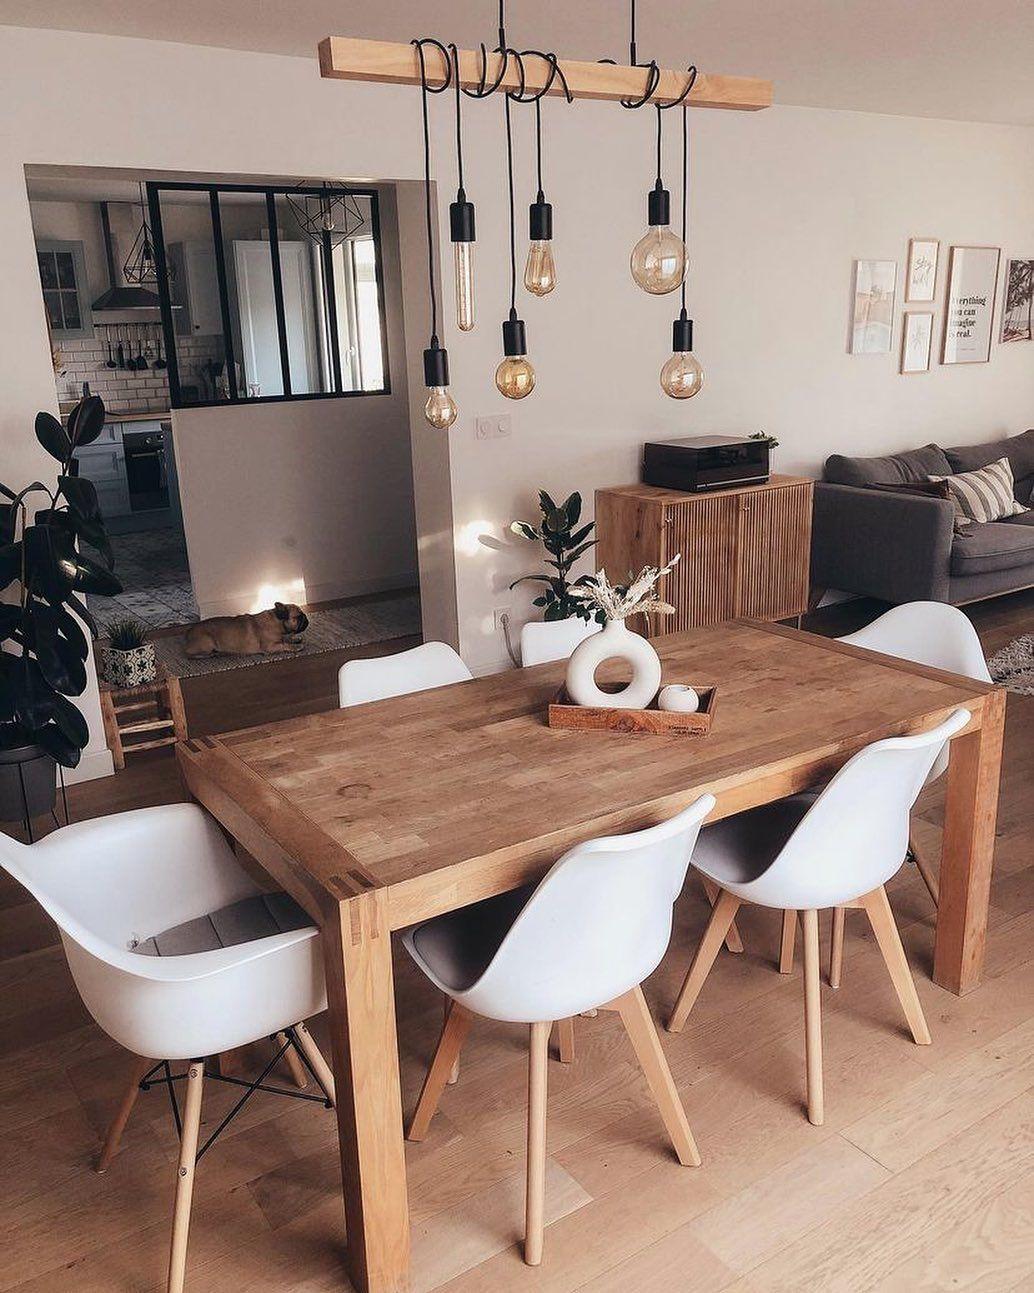 "Interior Inspiration on Instagram: ""Via @myinspiringinterior ✨ The table looks beautiful 😍 Credit: @lucie.home.deco  . . . . .  diningrooms  diningroomtable  diningroomstyle…"""